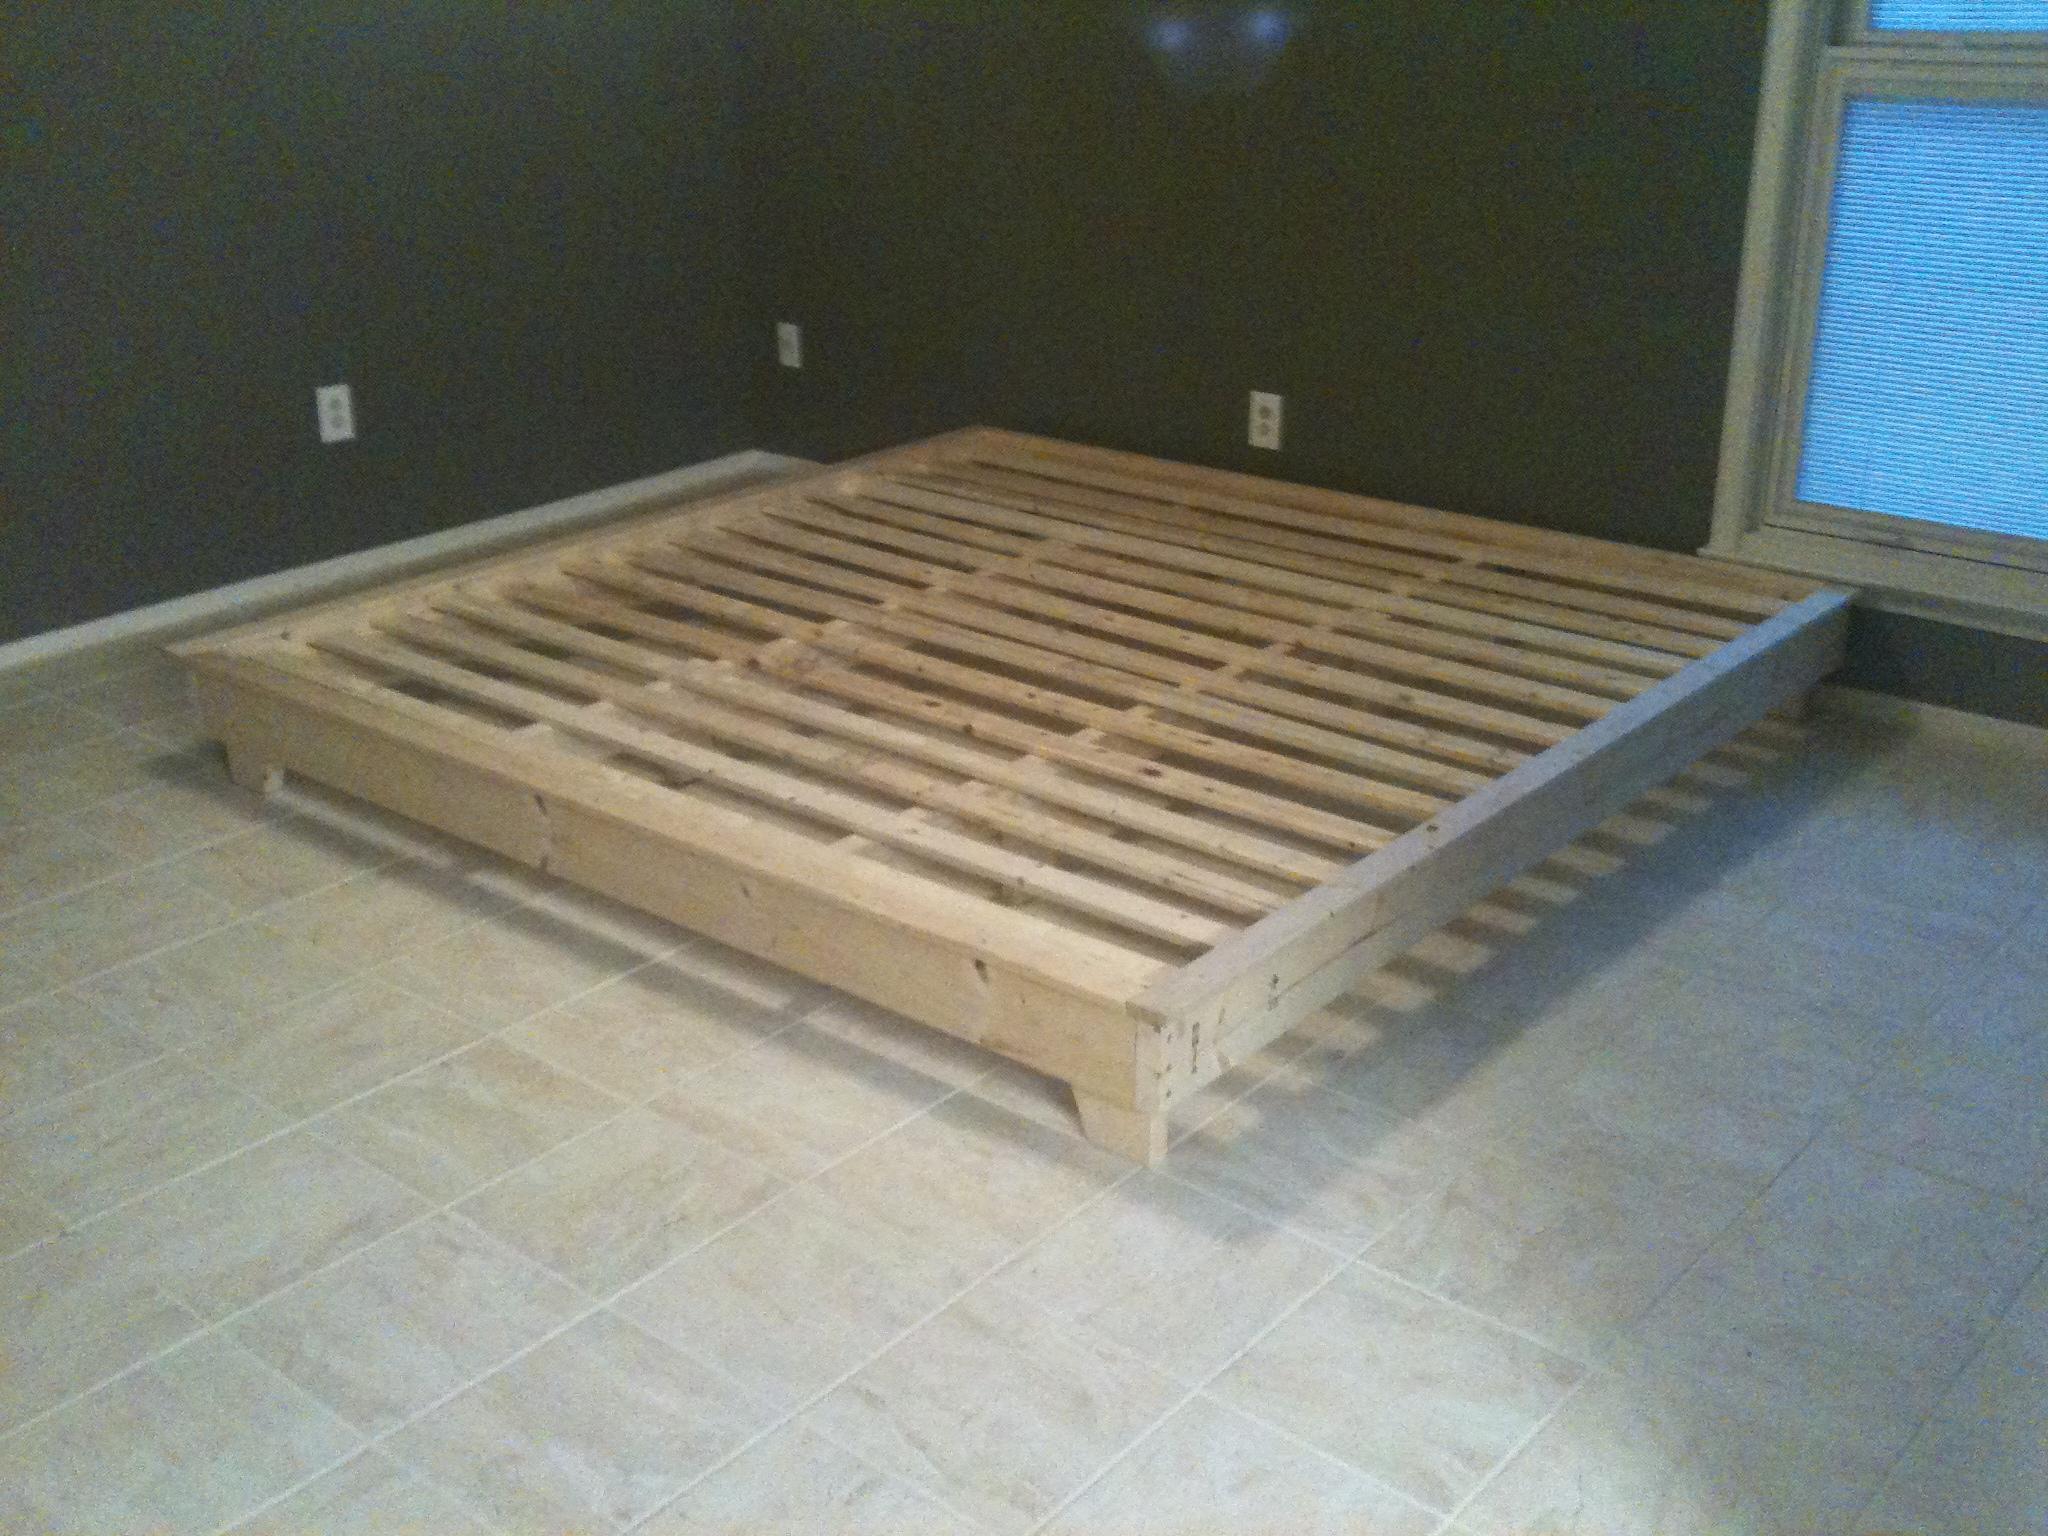 Build A Platform Bed With Storage Part 2. Expedit Queen Platform ...